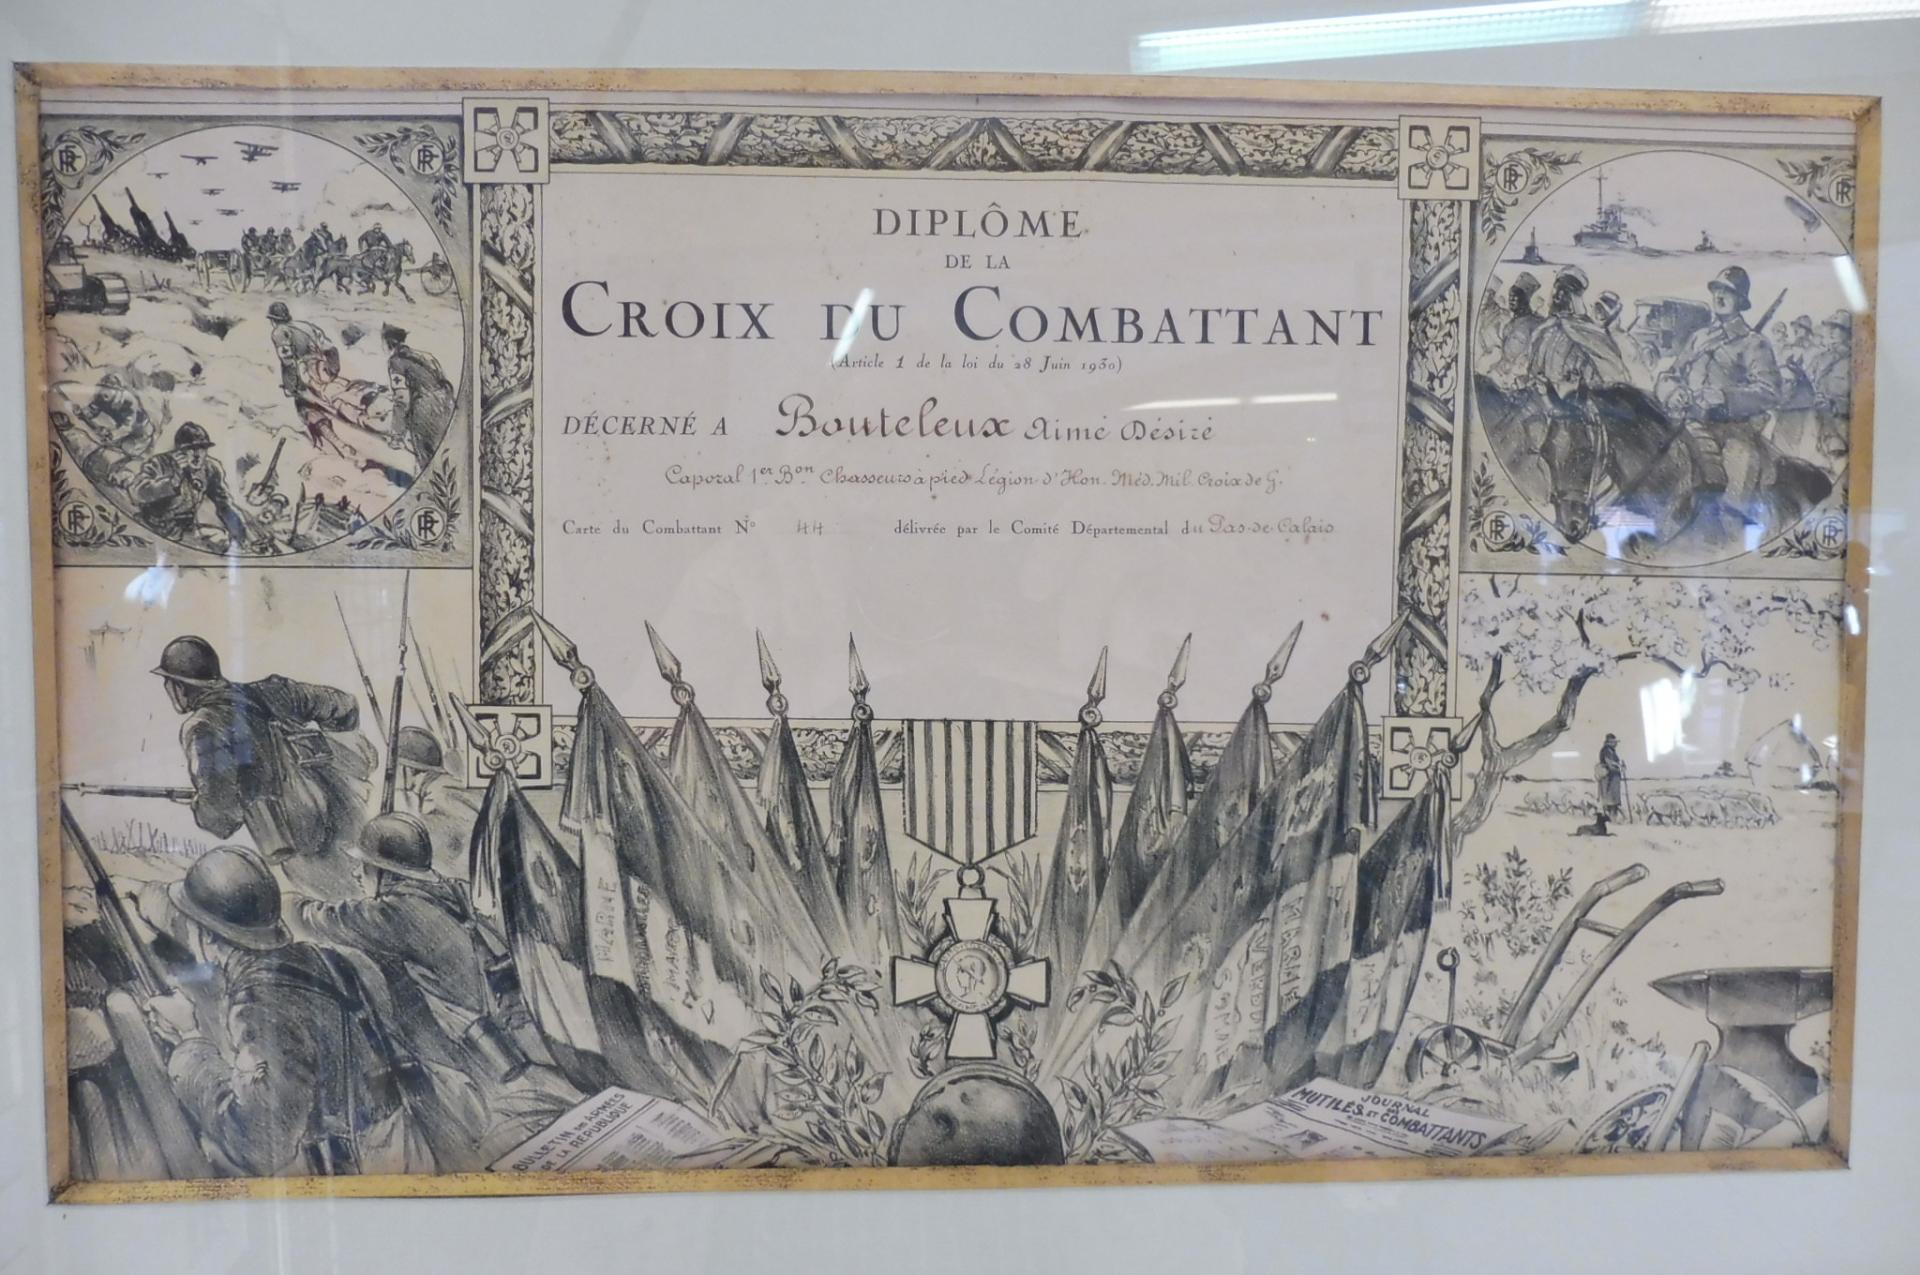 Diplome de Carte duCombattant